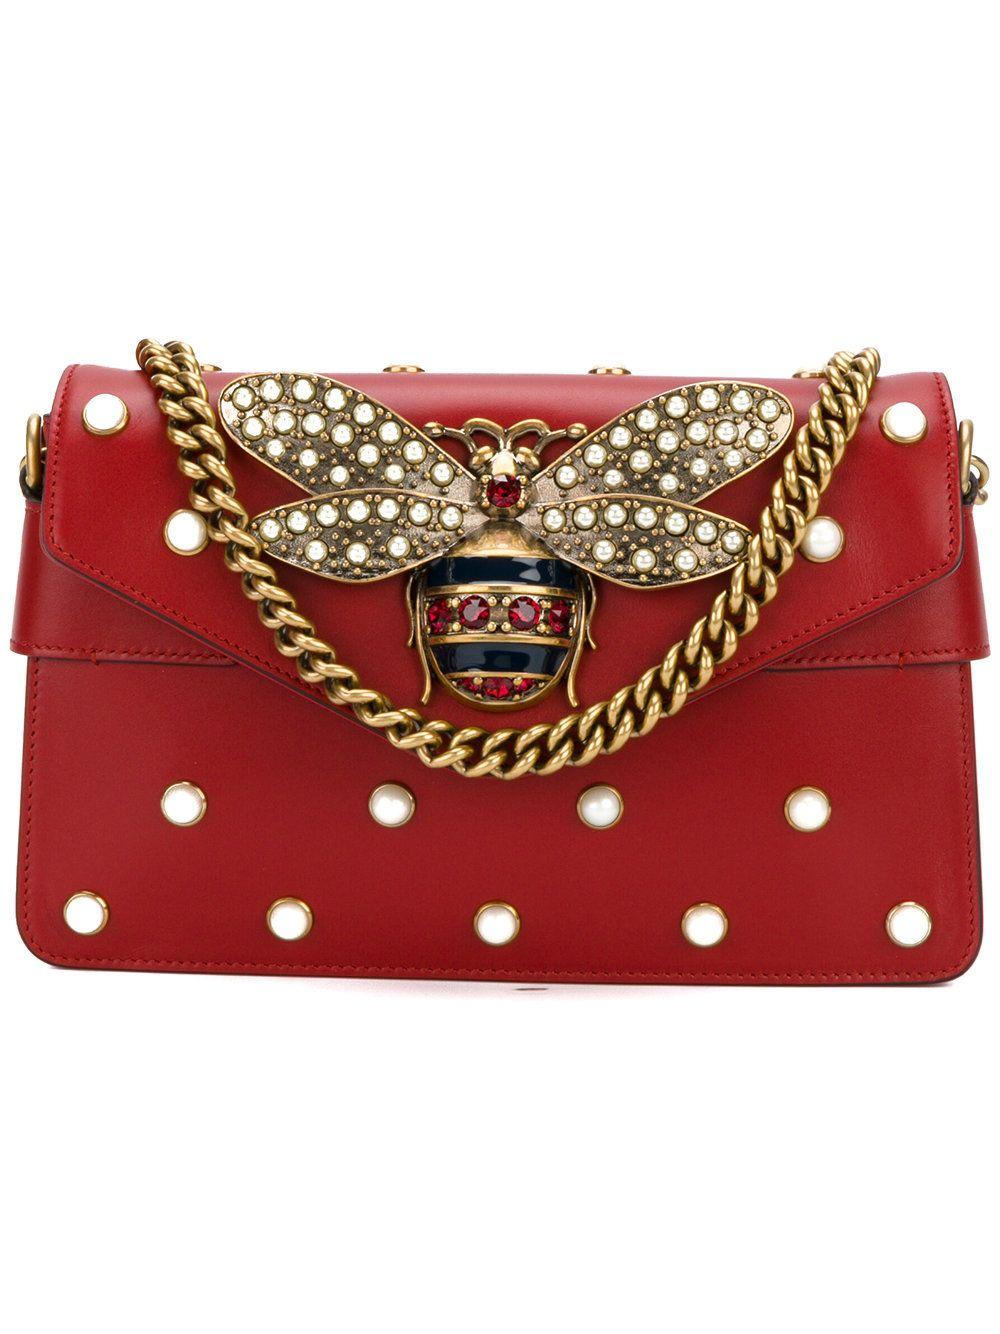 29b42f61ec8 Gucci Broadway shoulder bag · Gucci BagsBroadwayStriped BodiesShoulder BagsShoulder  StrapHigh FashionMini BagsRed LeatherFall ...